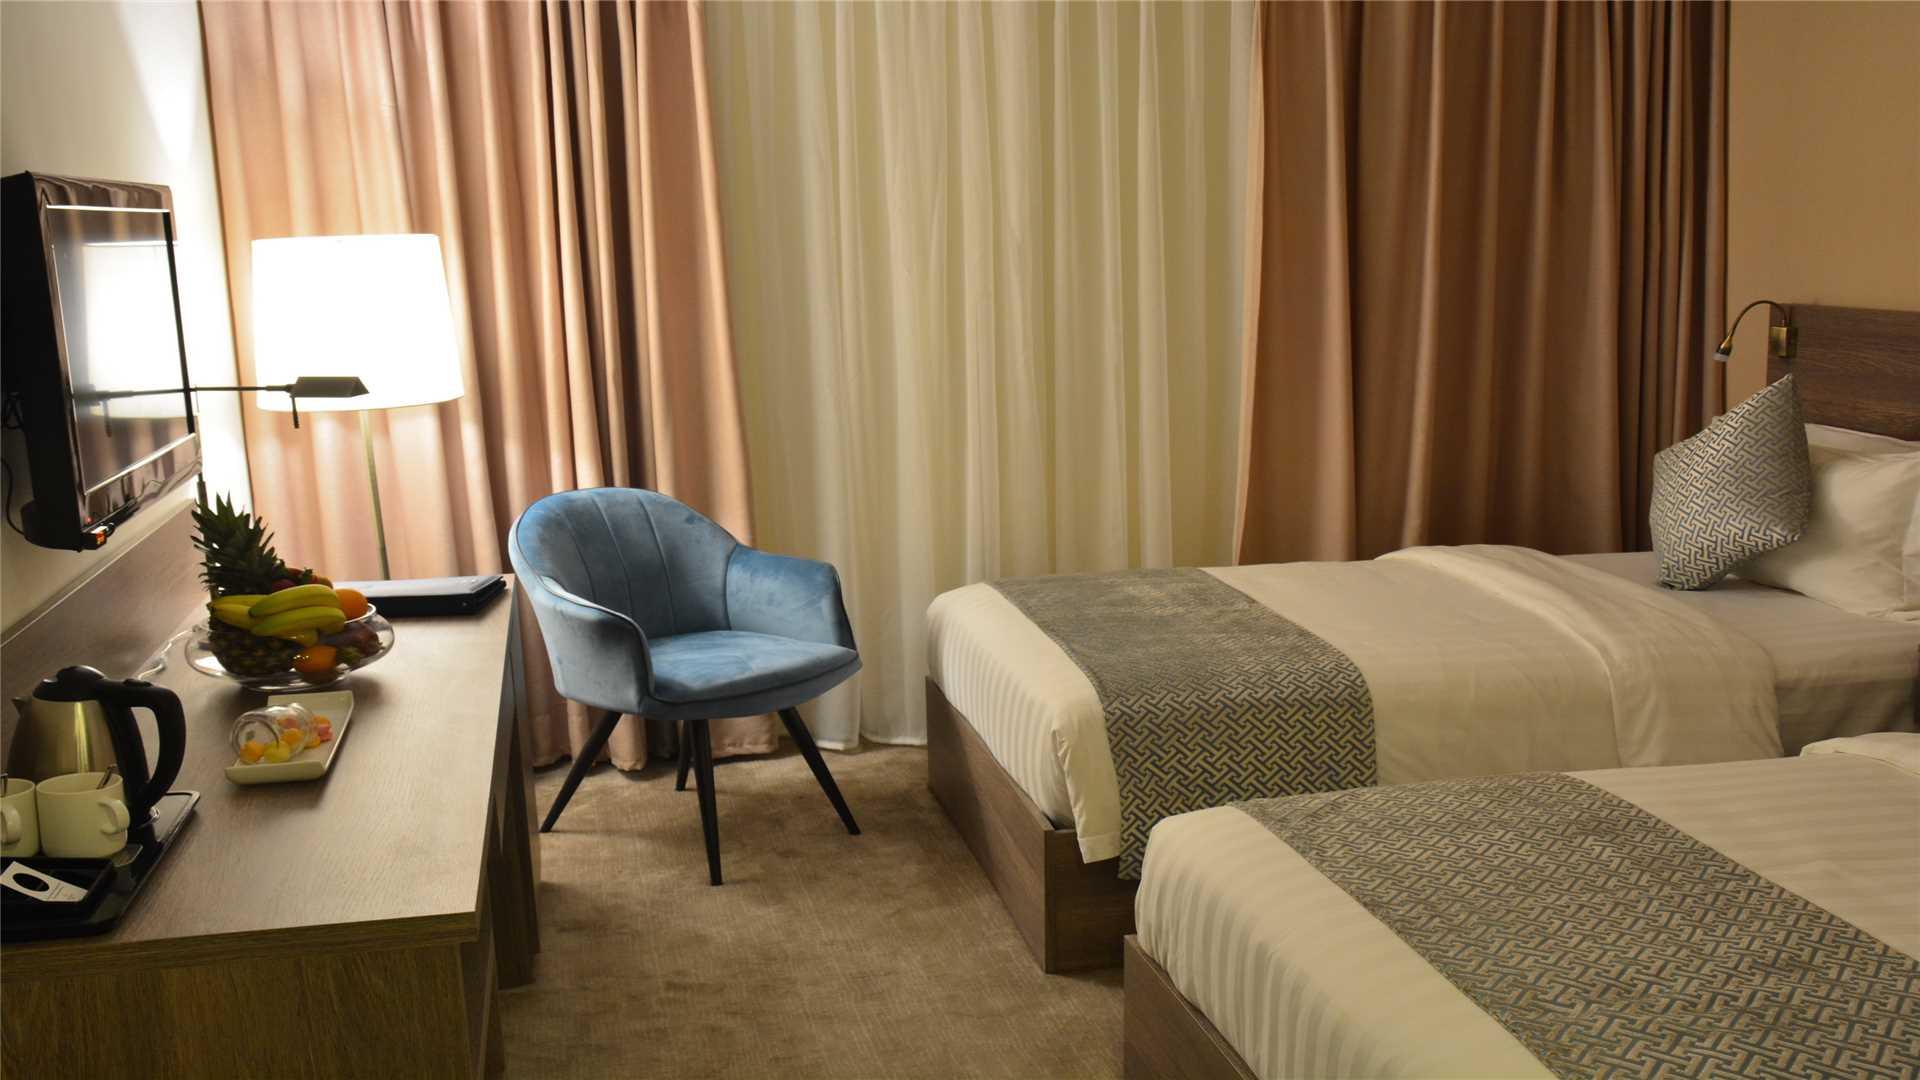 The Sanrock Hotel in Amman Superior Room